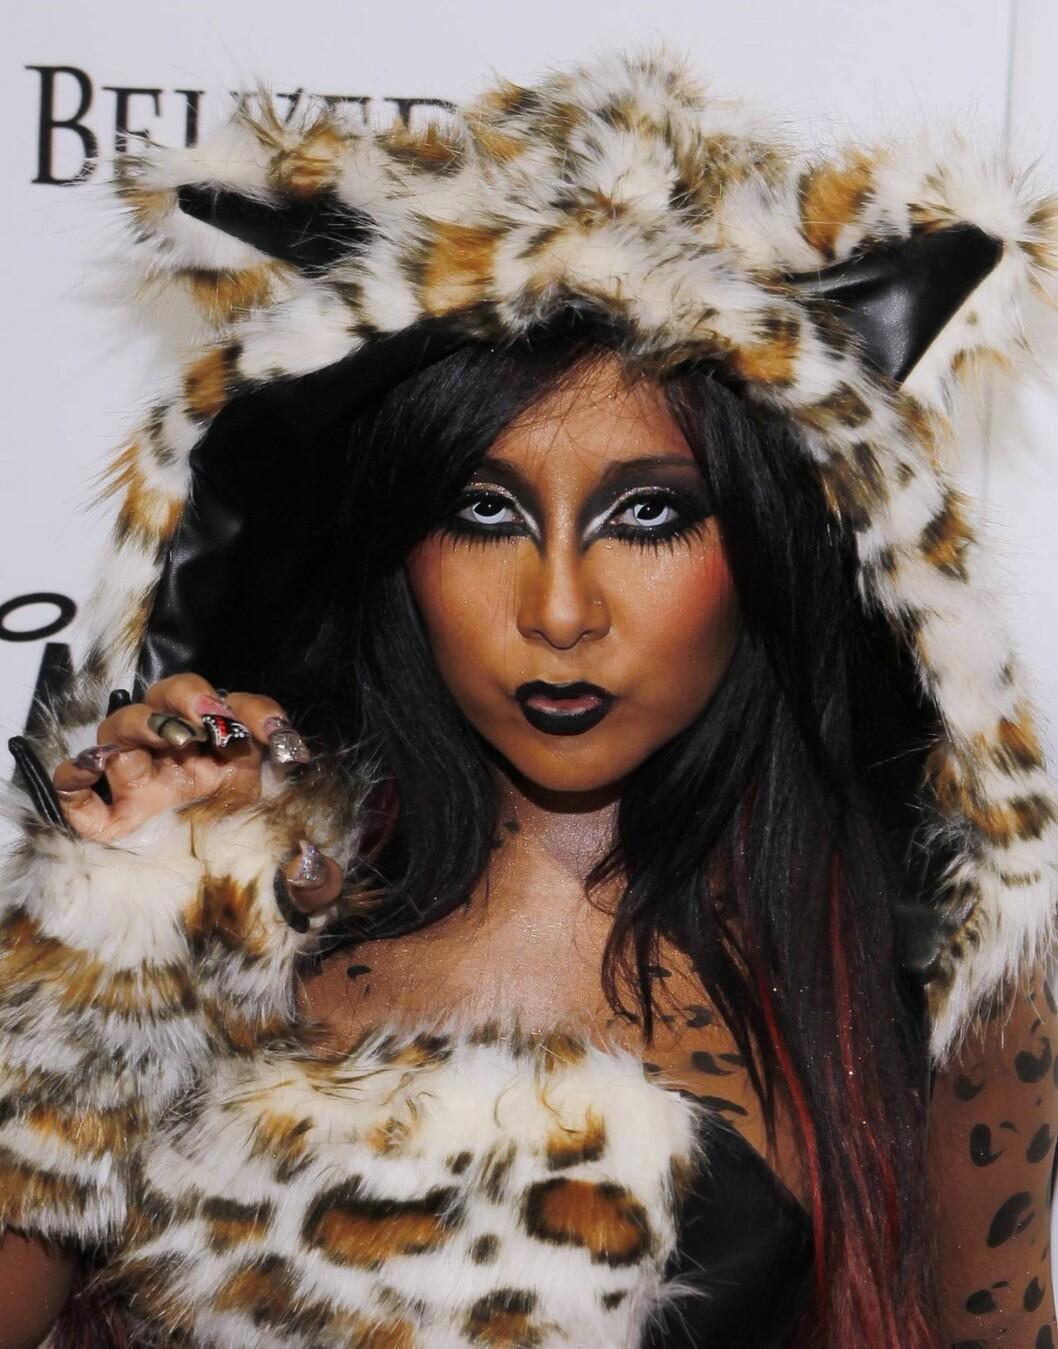 DYRISK: Nicole «Snooki» Polizzi, kjent fra TV-serien «Jersey Shore», var dyrisk på halloweenfest i Las Vegas. Foto: All Over Press